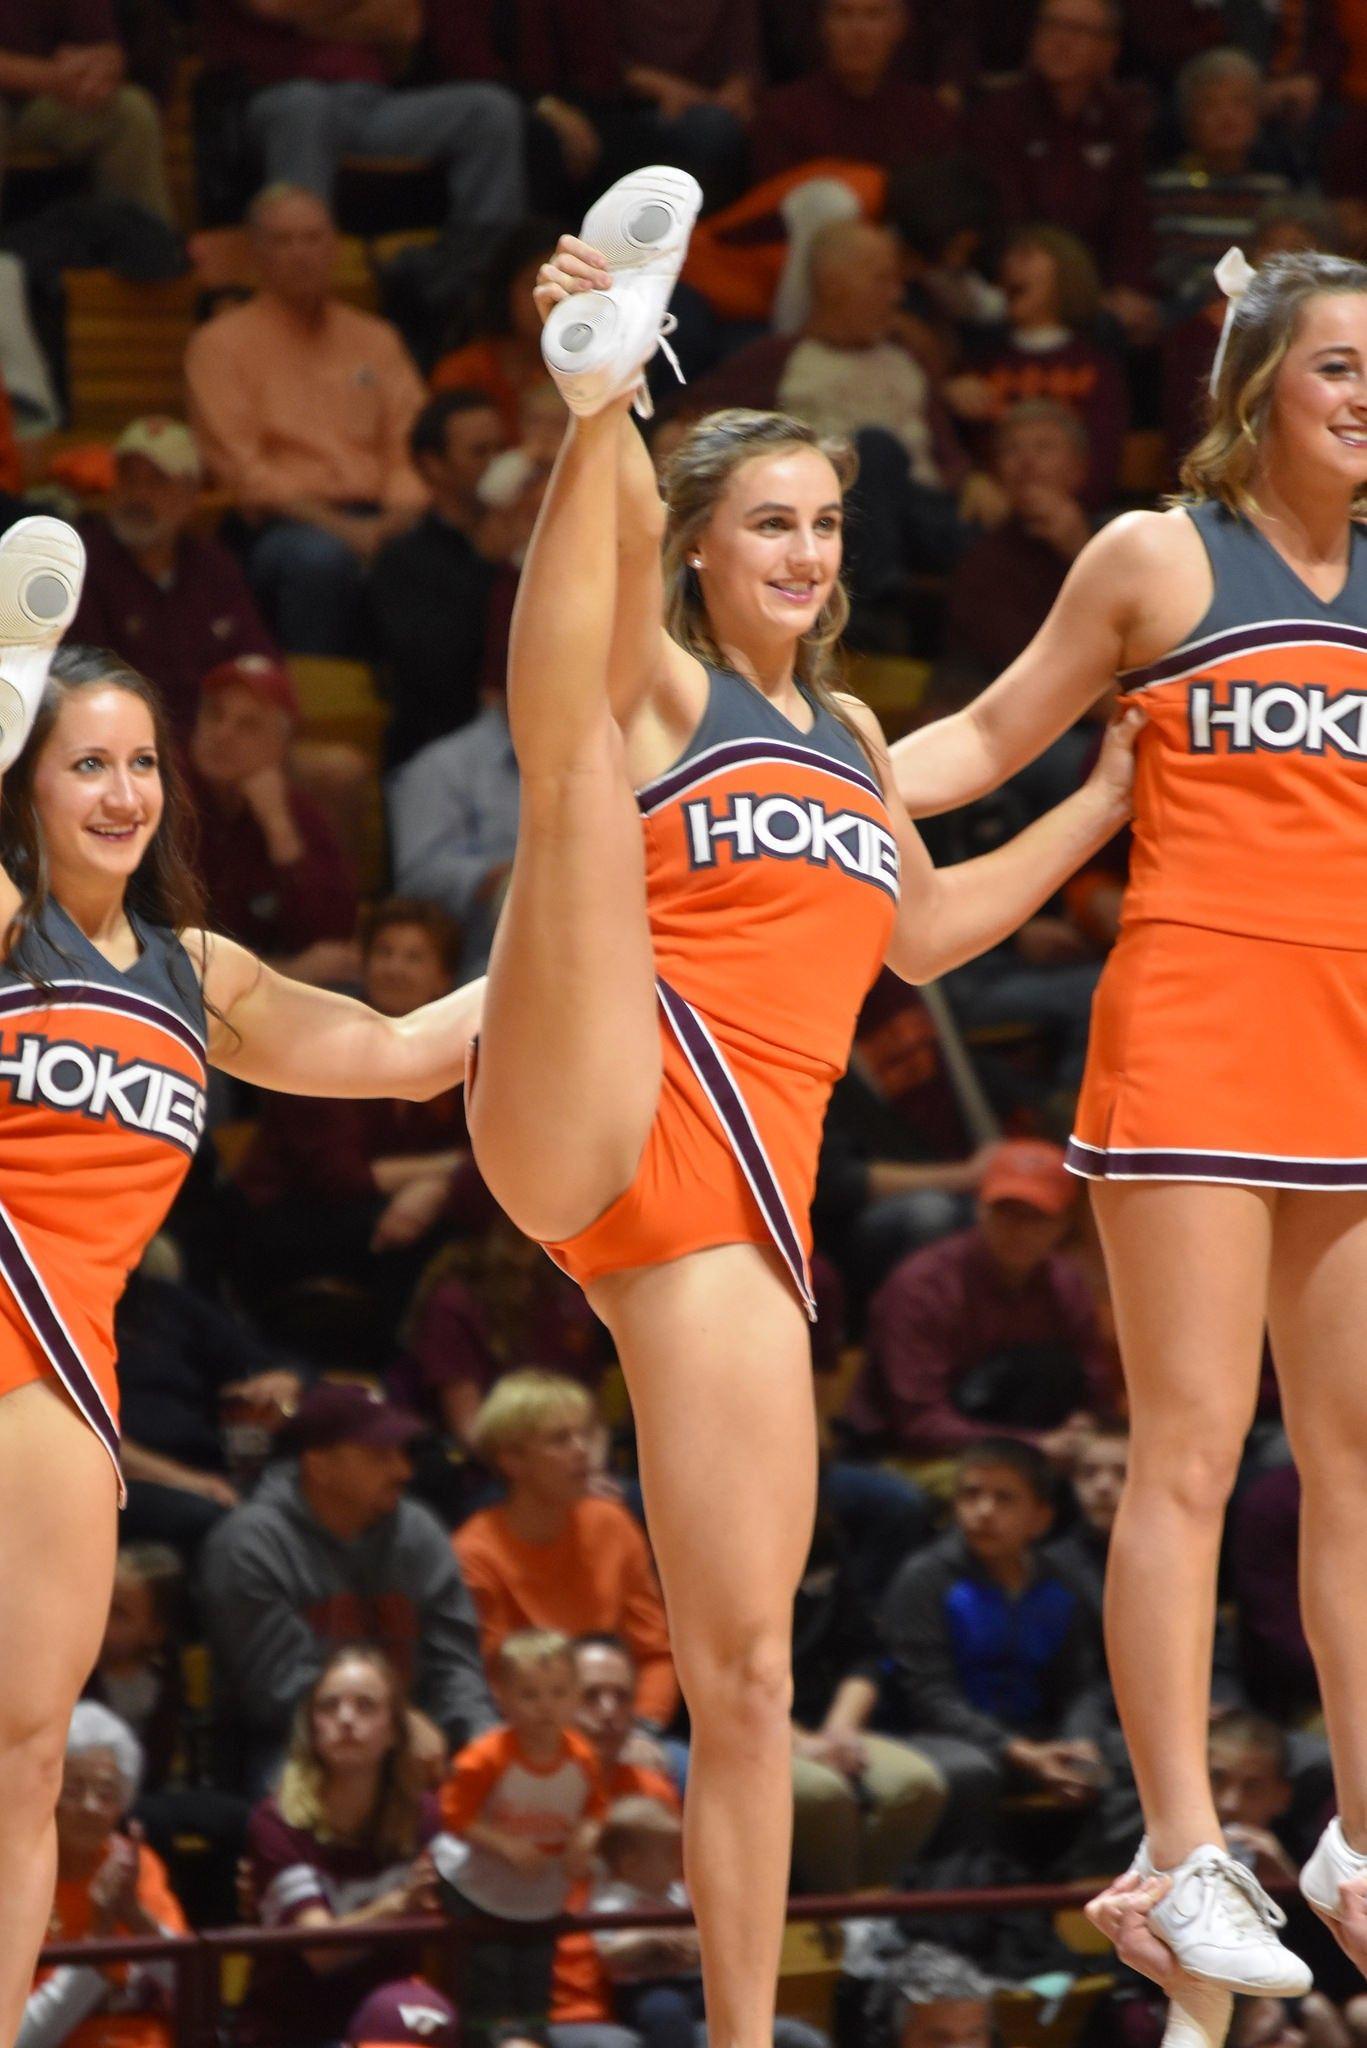 Tight Cheerleading Body Gracie's Massage